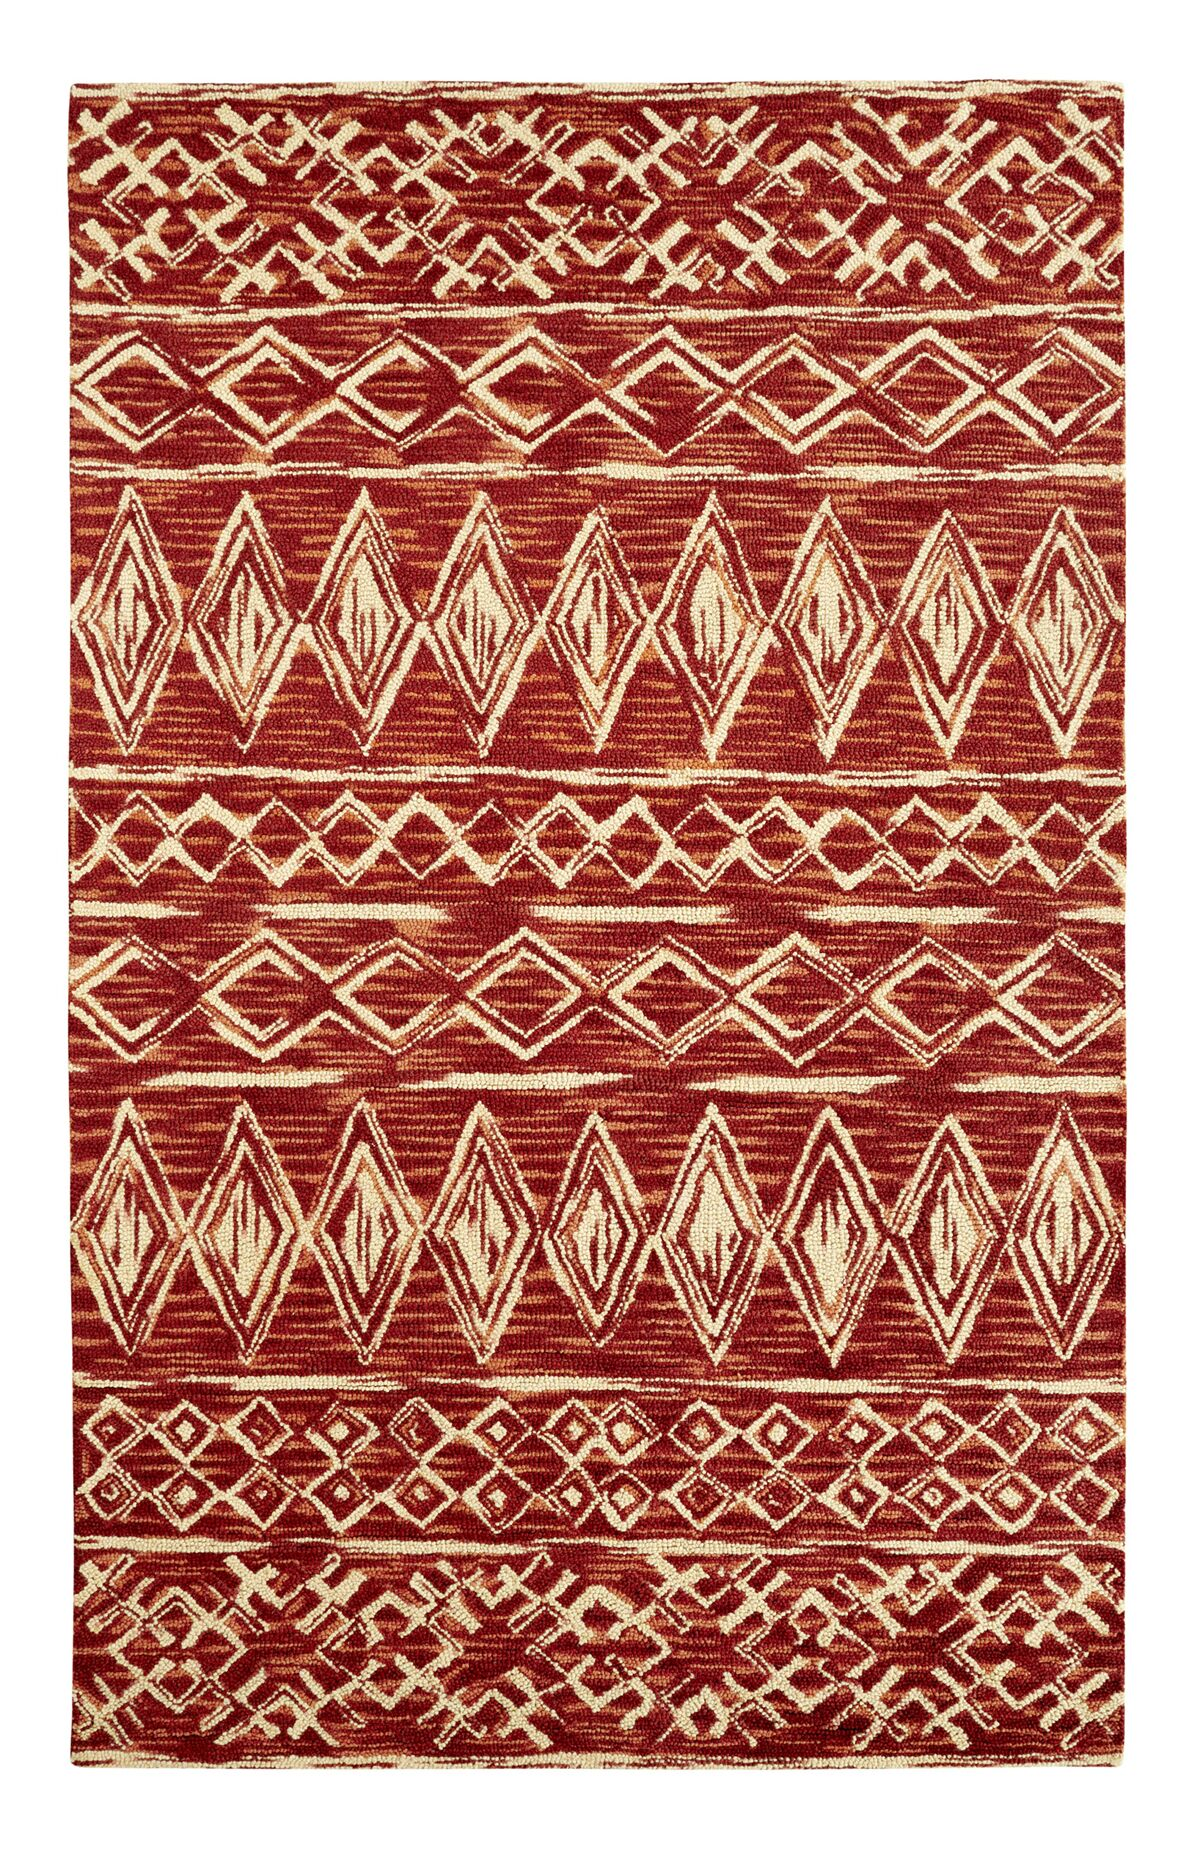 Dream Handwoven Flatweave Wool Rust Area Rug Rug Size: Rectangle 3'3